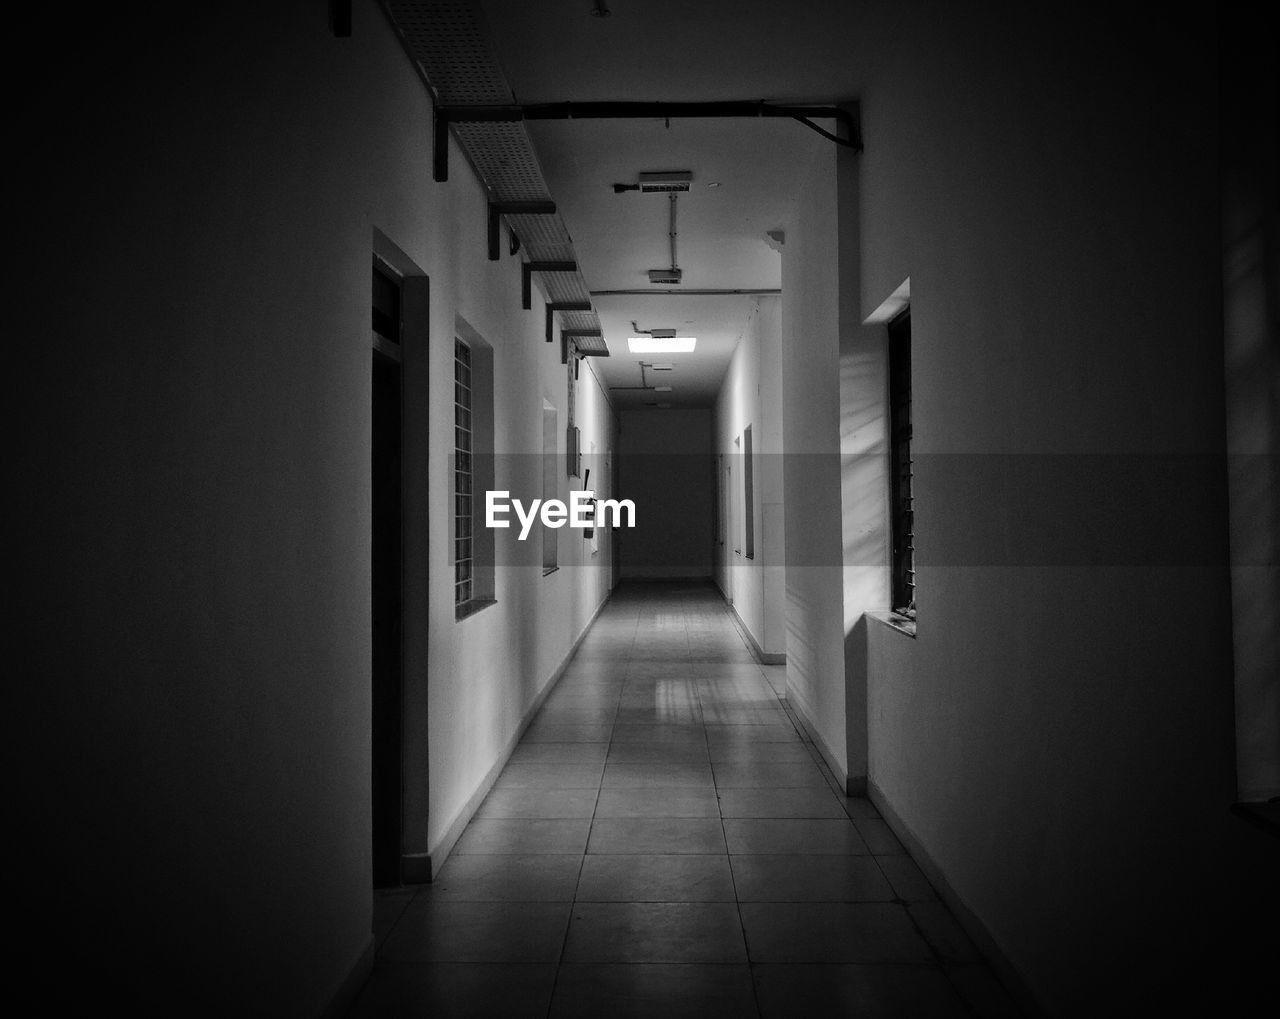 indoors, corridor, the way forward, empty, door, illuminated, architecture, no people, day